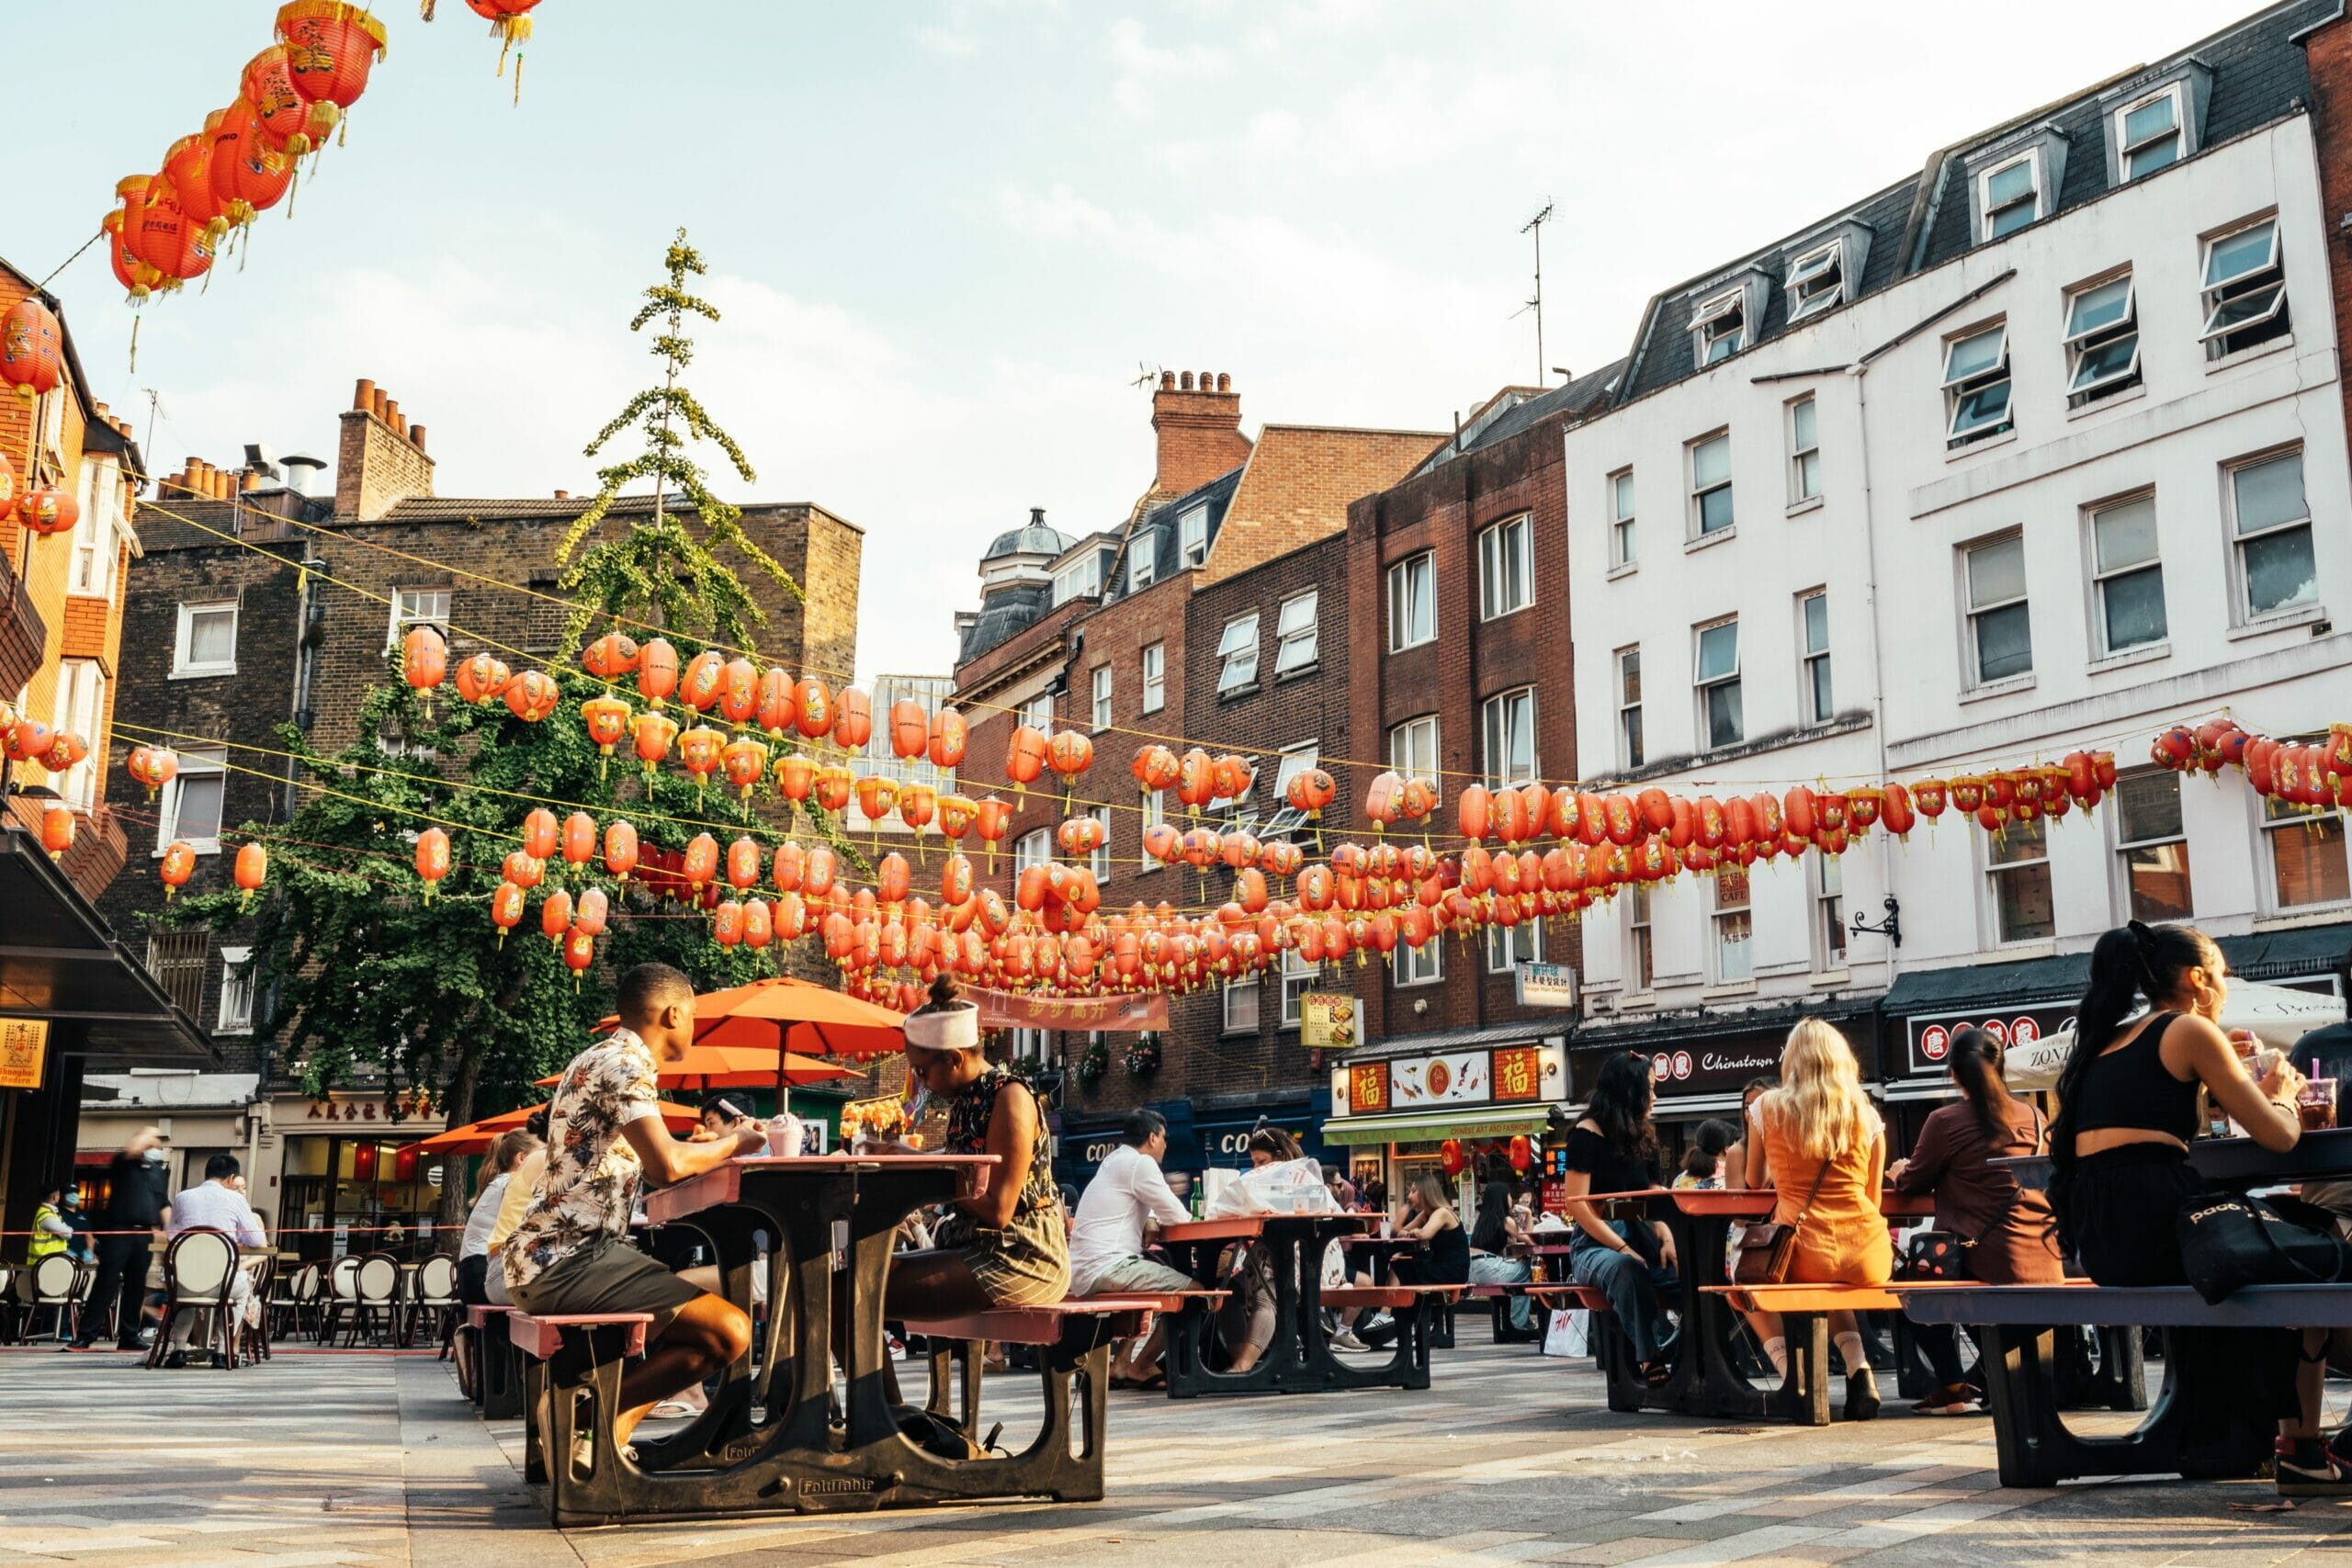 chinatown pedestrianised london